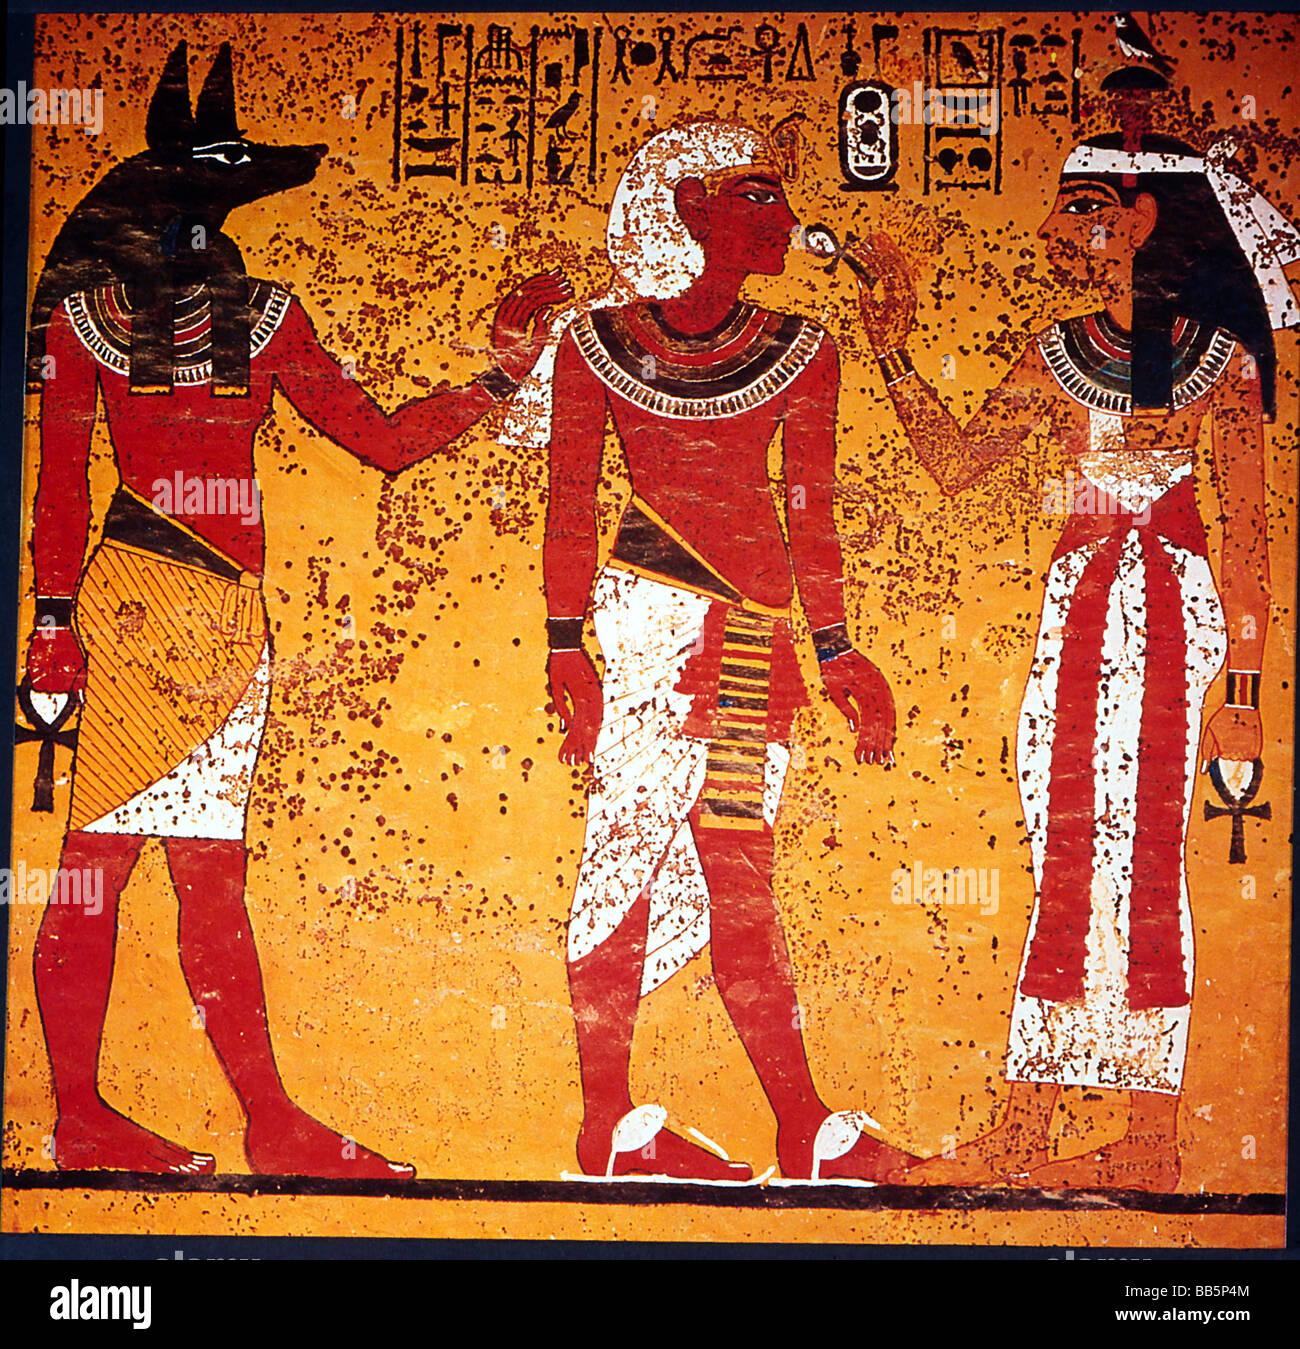 Tutankhamun, King of Egypt, 1333 - 1323 BC, 18th Dynasty, full length, with God Anubis and Goddess Hathor, mural - Stock Image